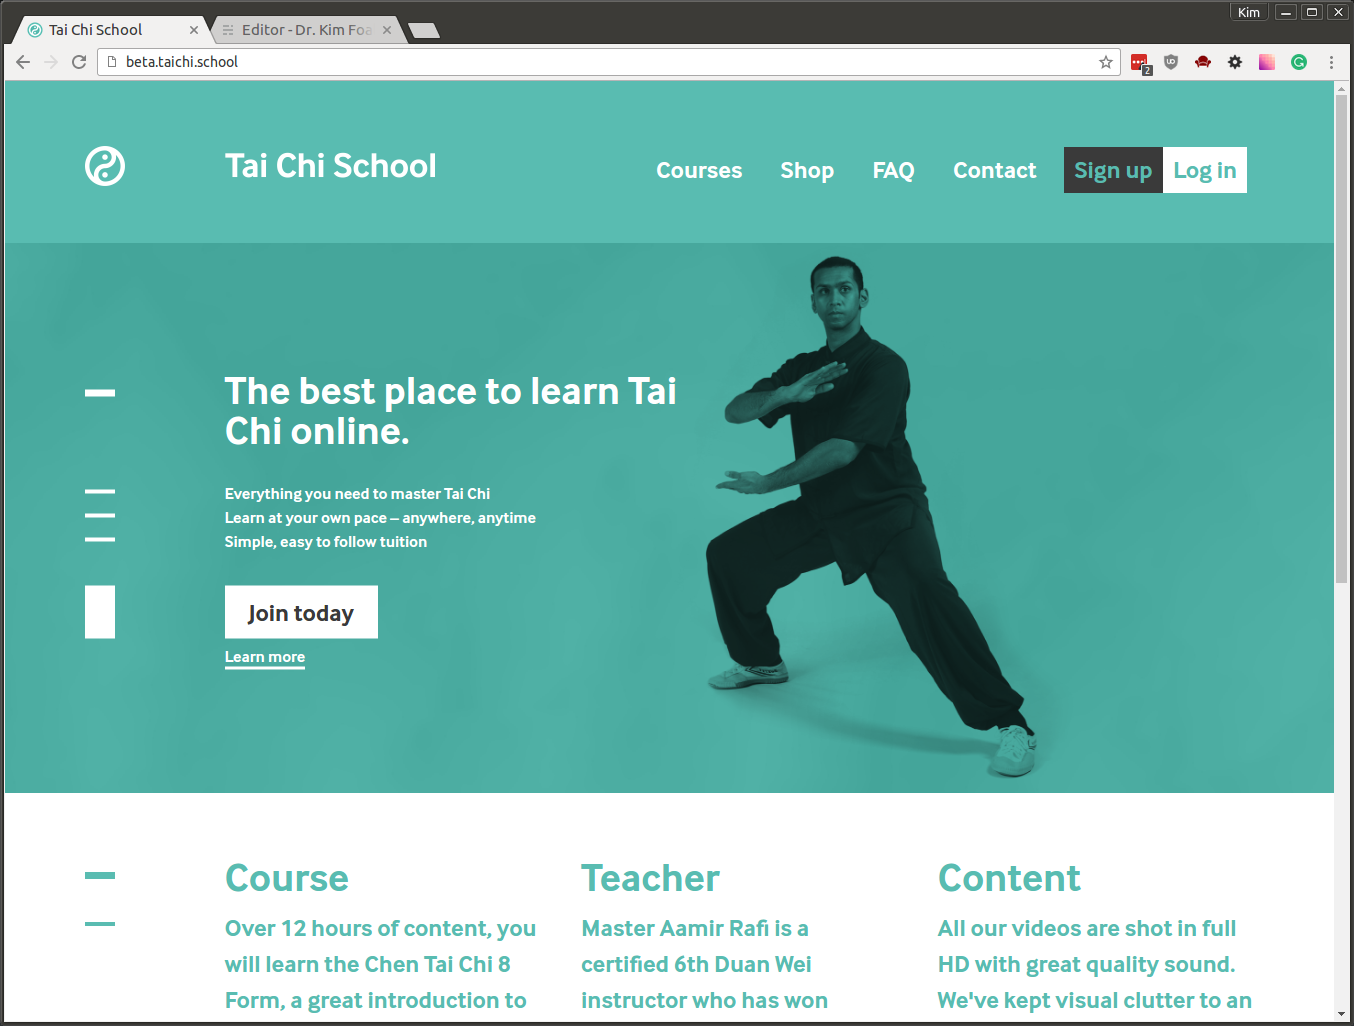 Tai Chi School